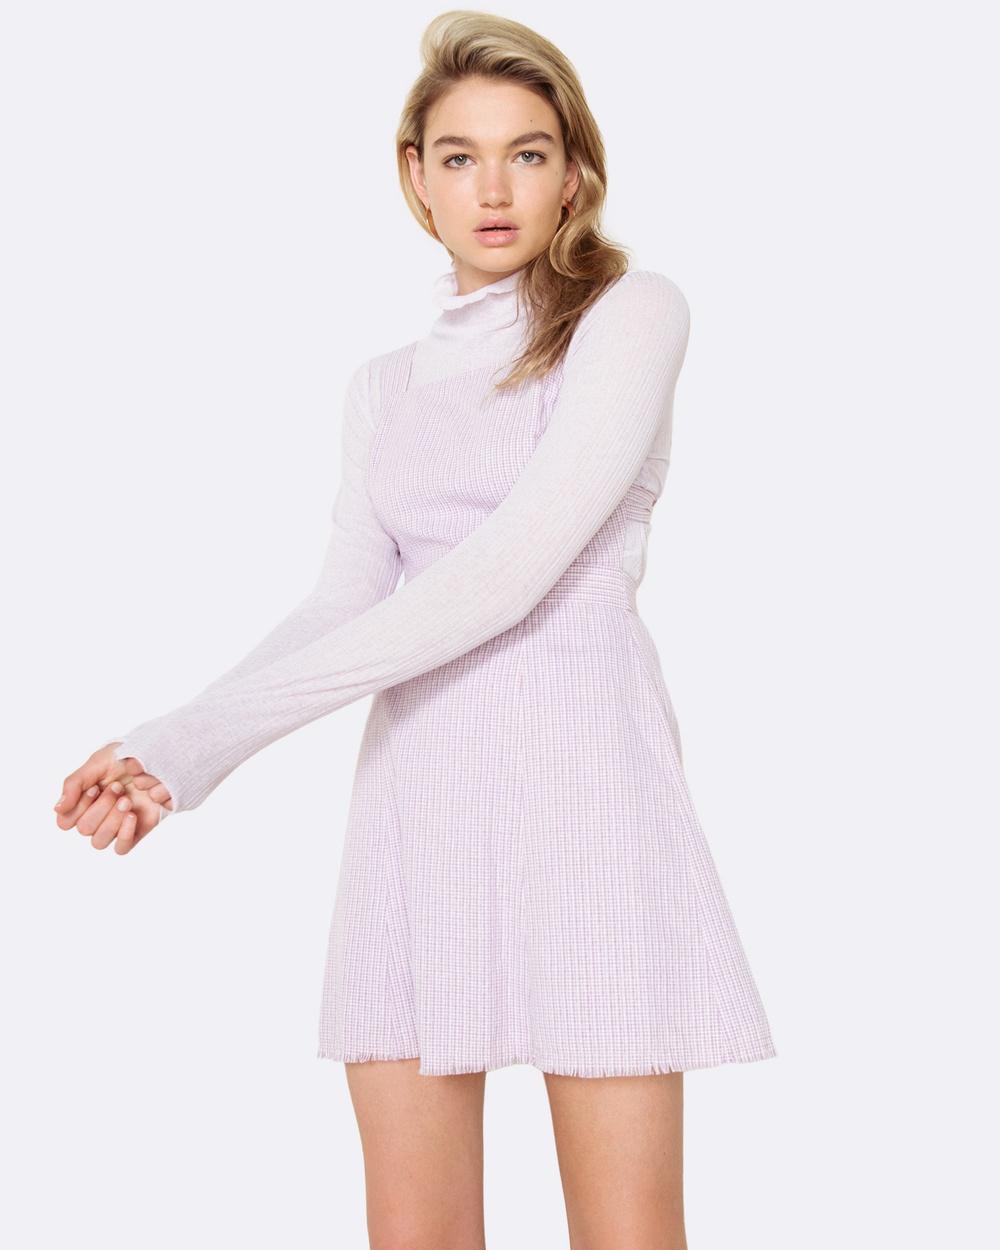 The East Order Portia Mini Dress Dresses Lilac Portia Mini Dress